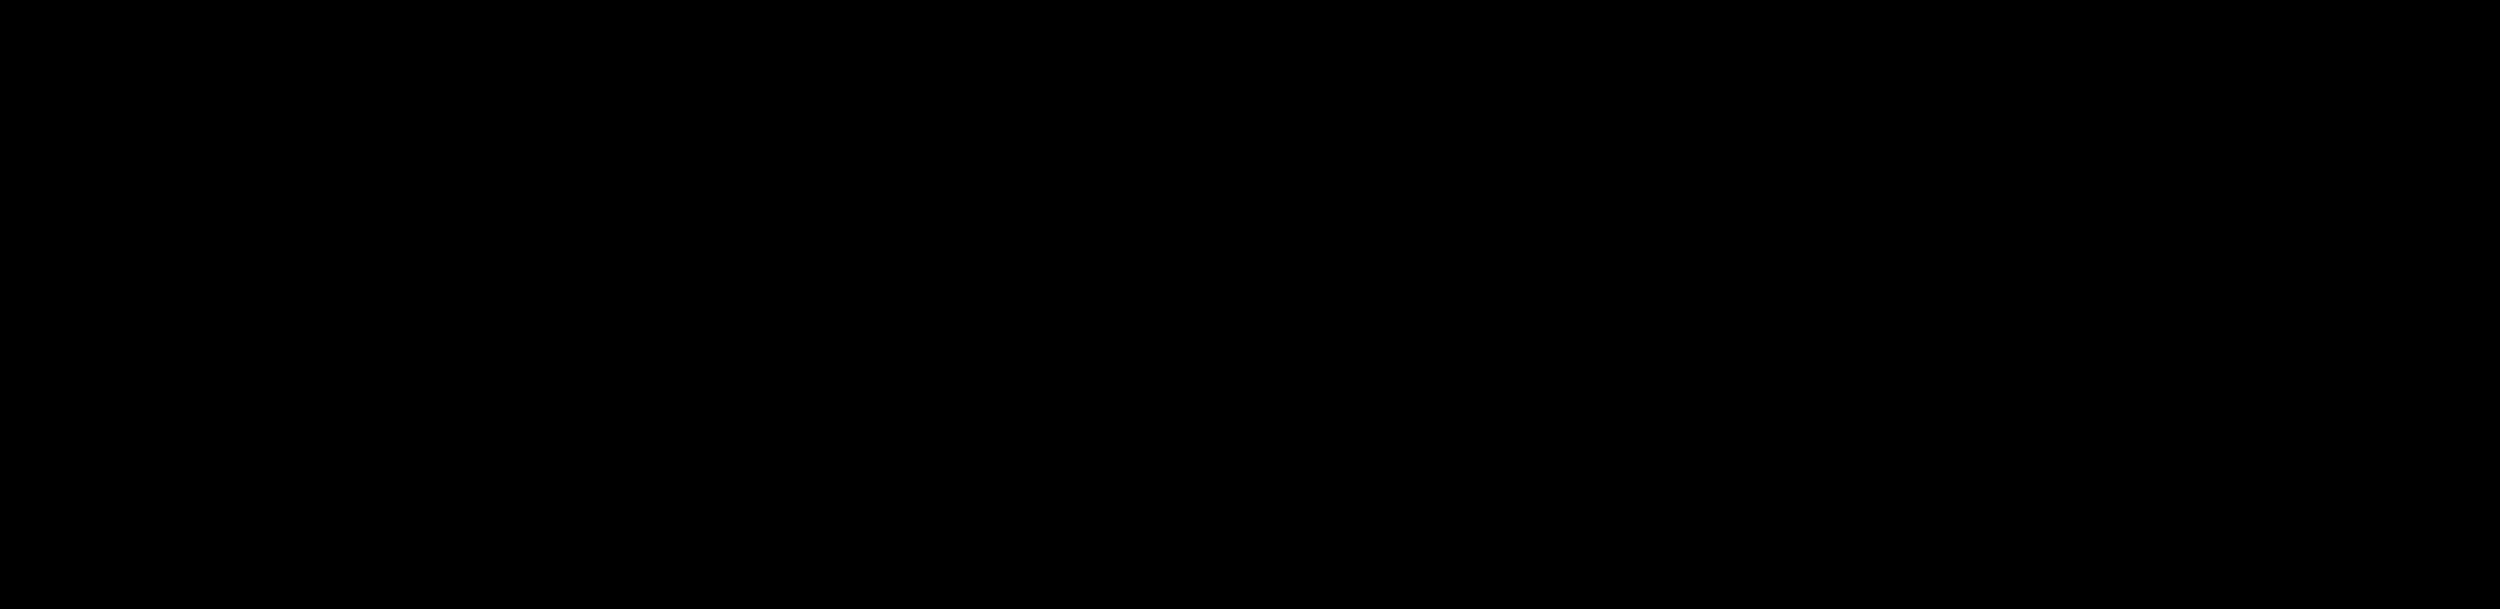 Preqin Logo-black.png